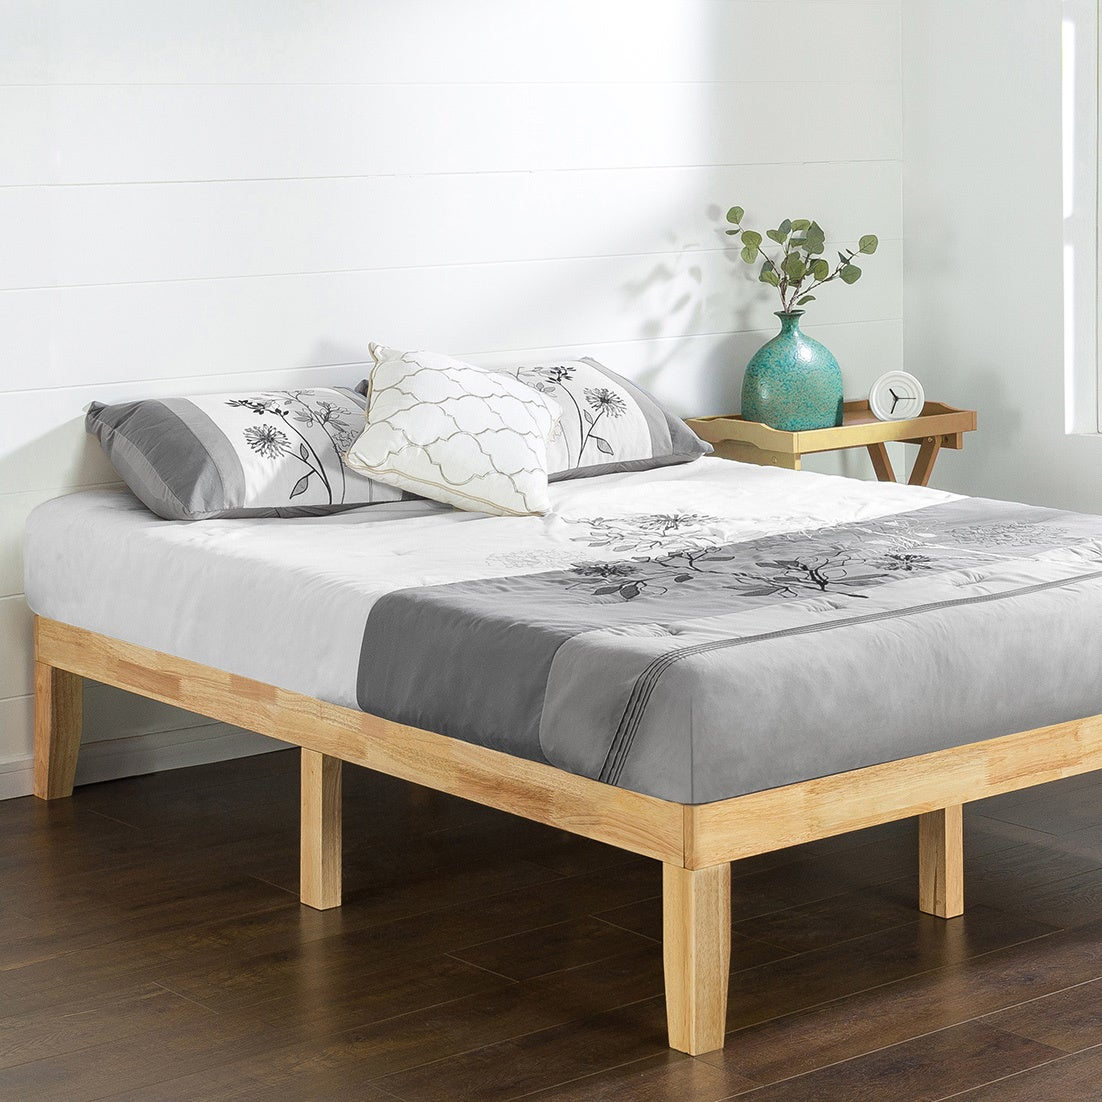 Shop Priage By Zinus Solid Wood Platform Bed Natural Free